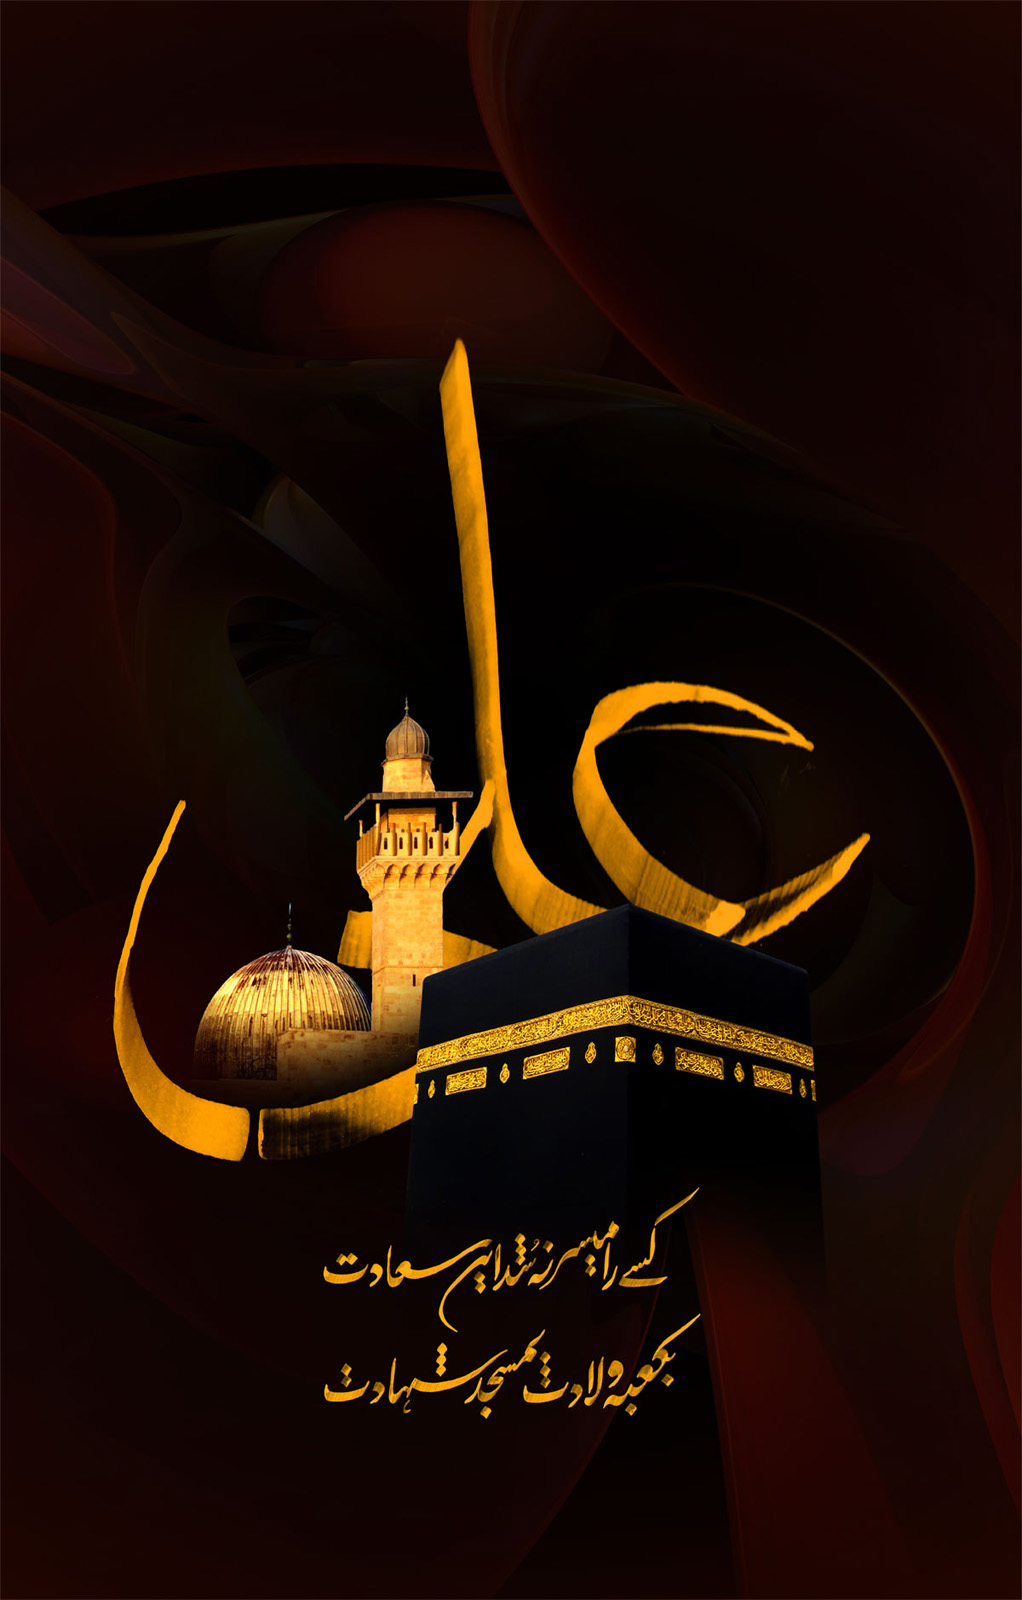 Ya Hussain Wallpapers Ali A Wallpaper - Wall...